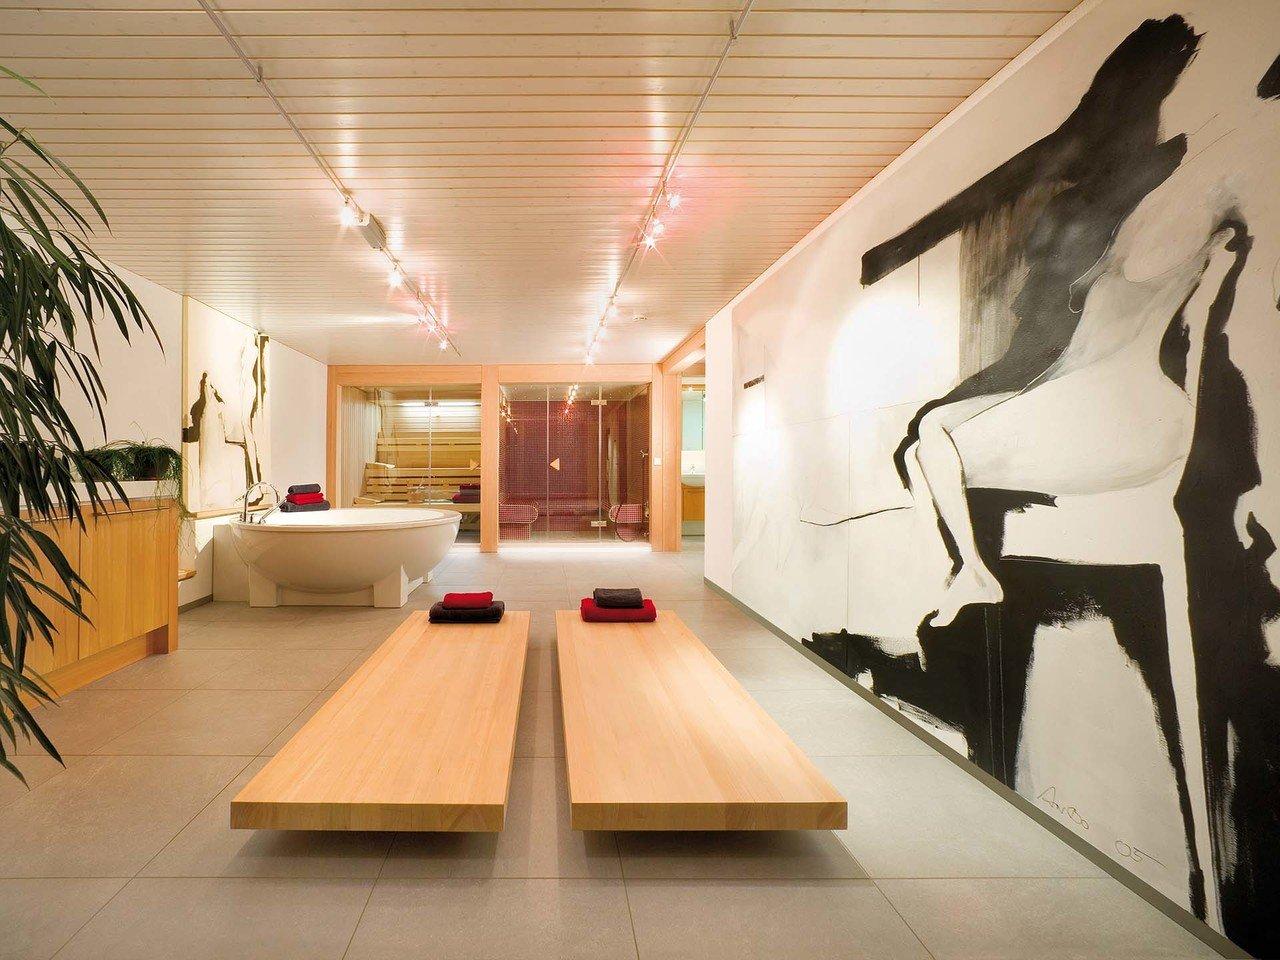 Musterhaus HUF Haus ART 3 - Oase